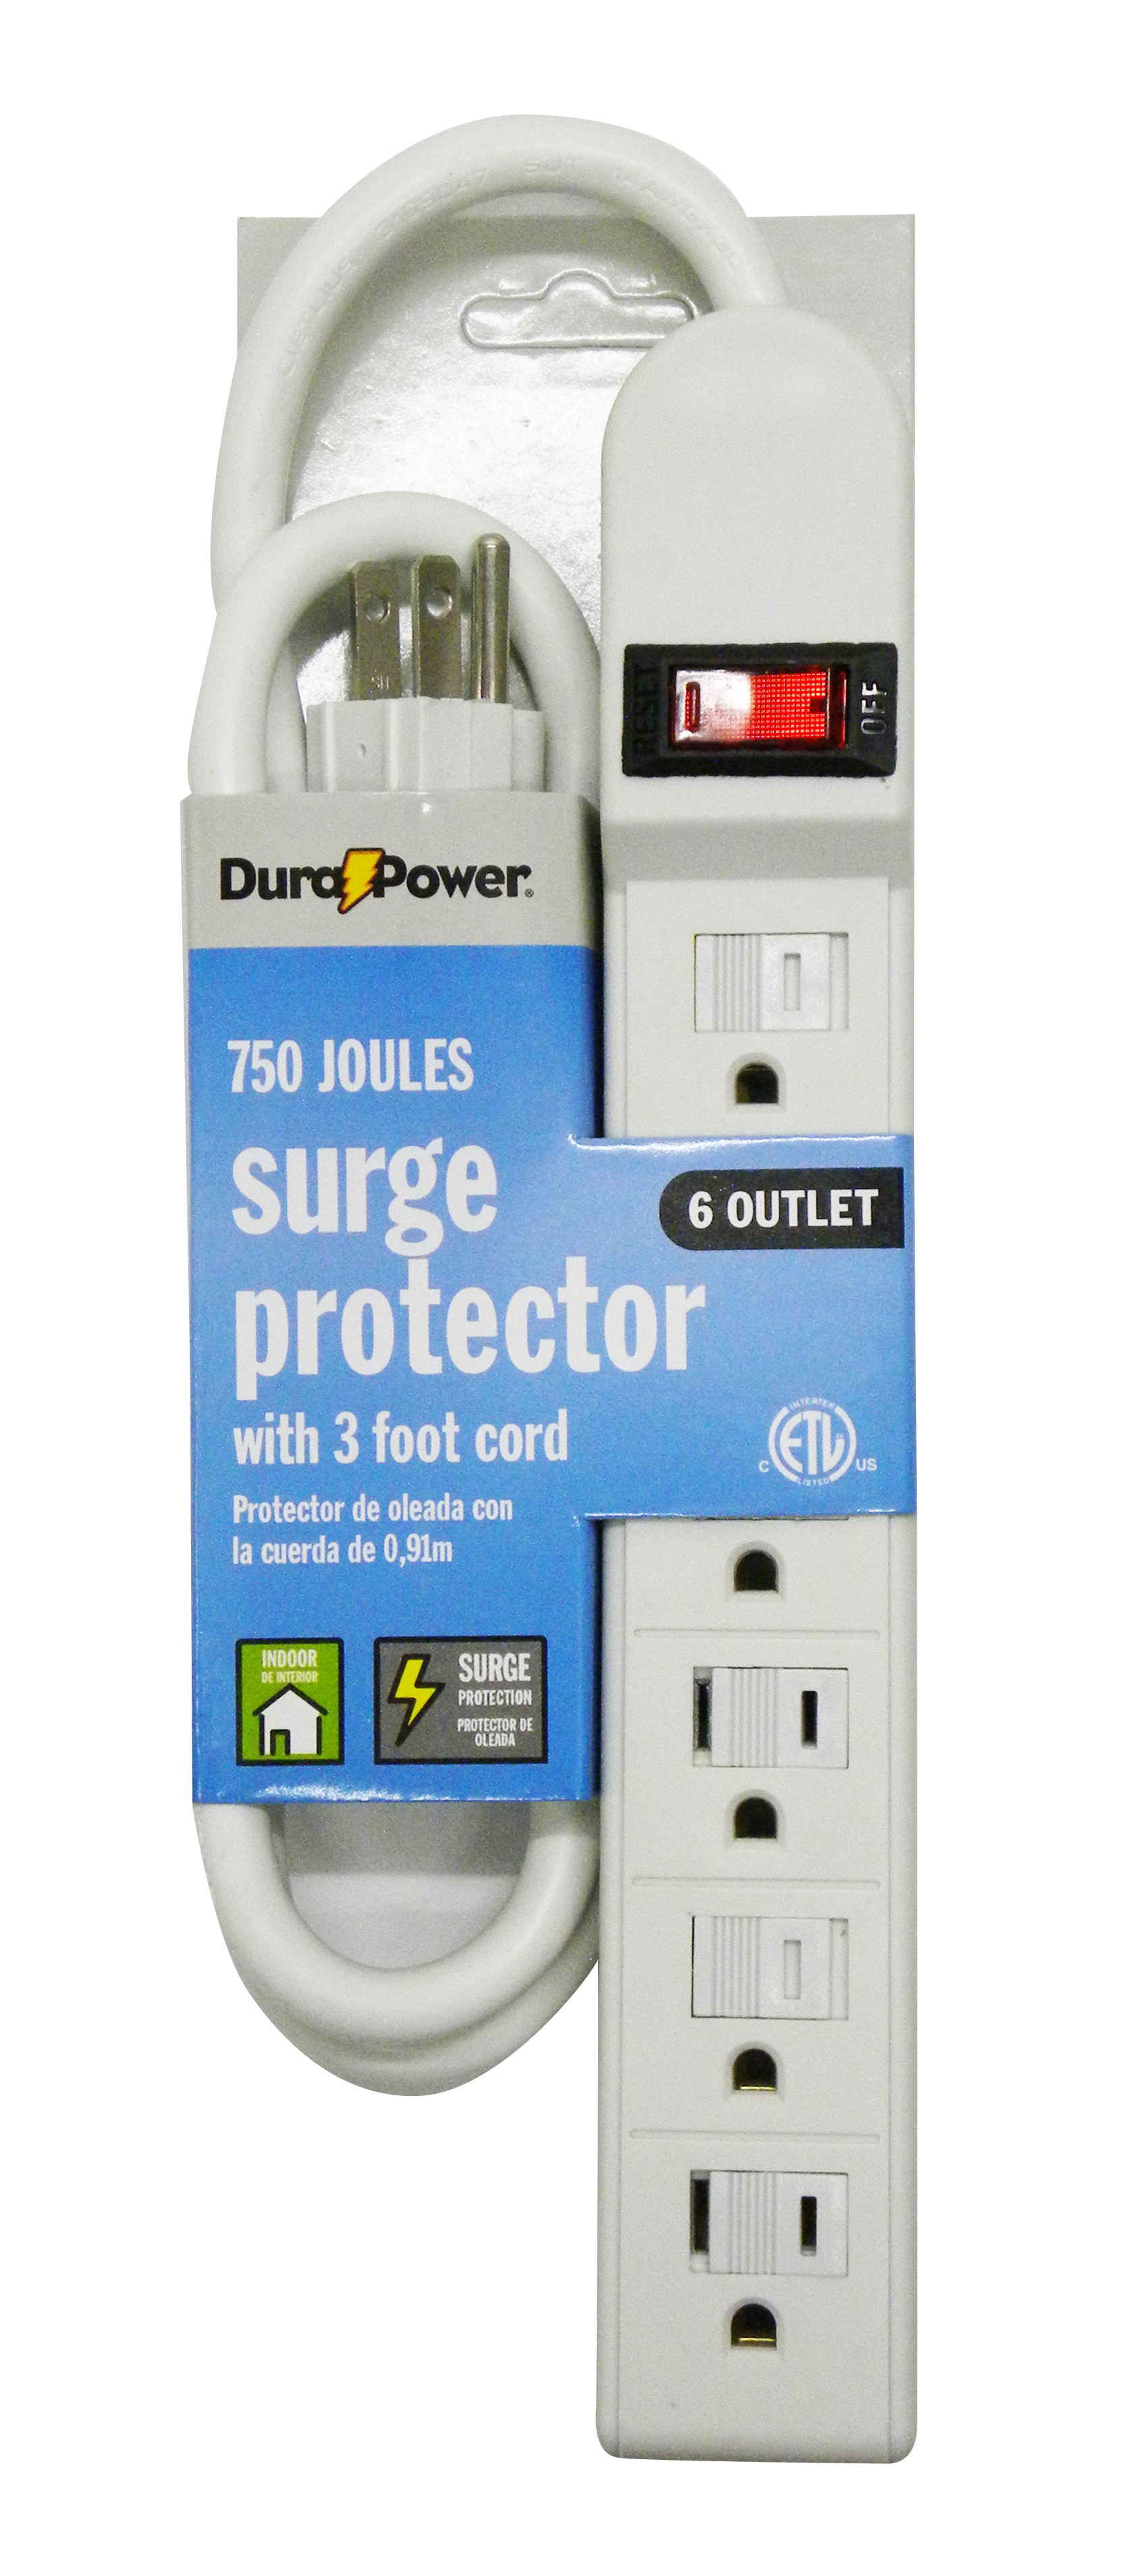 Dura Power Dura Power ATT037 6 Outlet Surge Protector im test